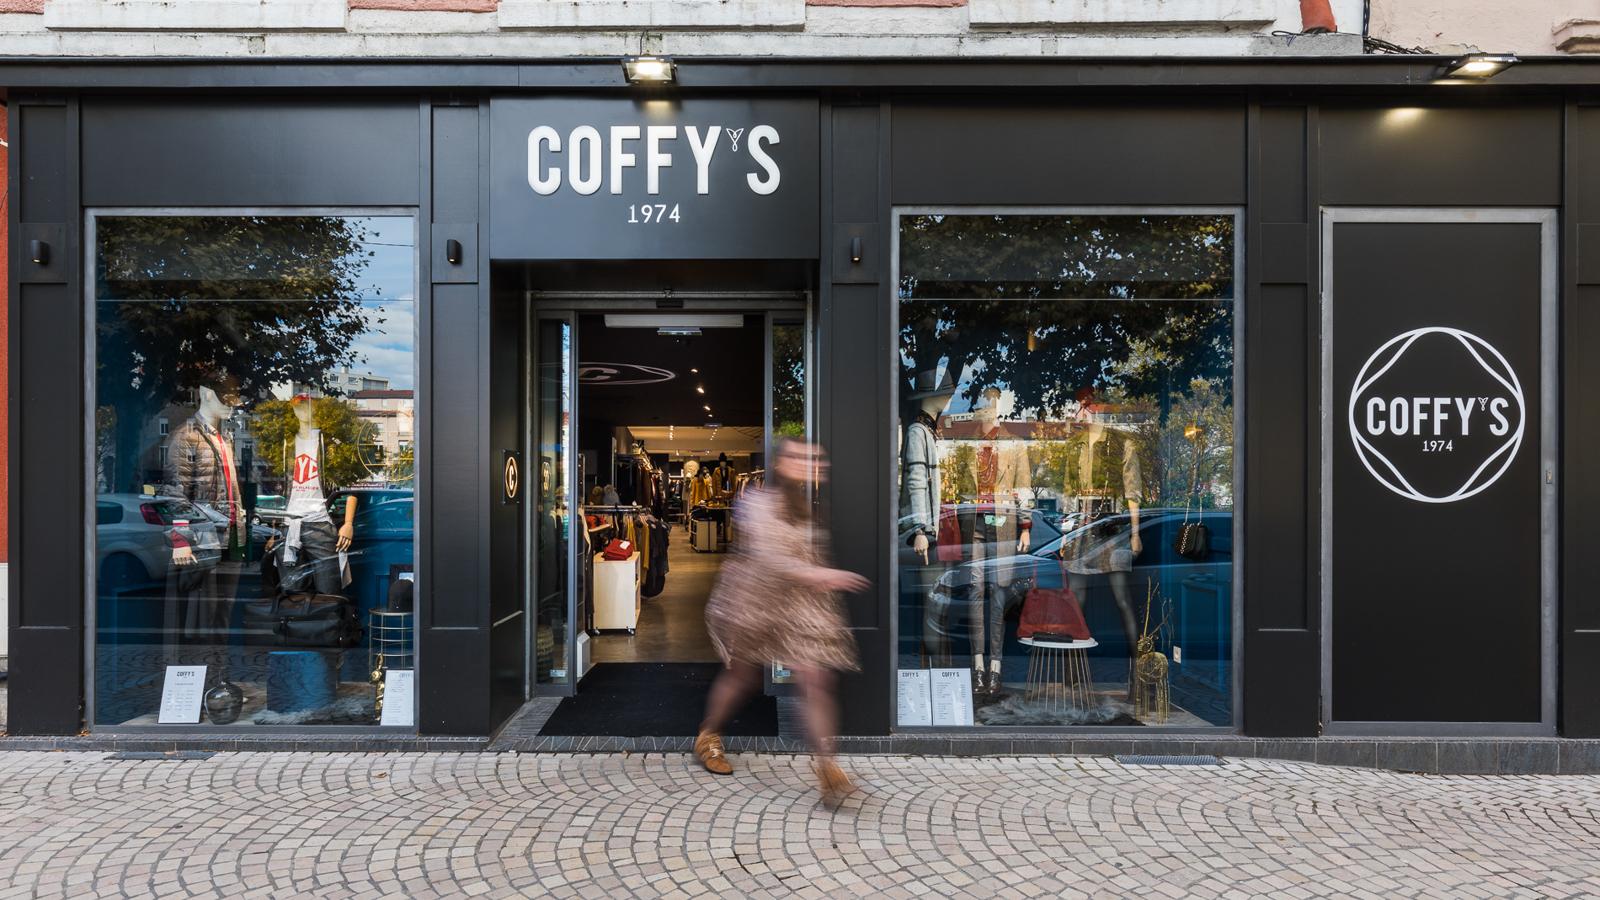 boutique_coffys_photographie_commerce -4.jpg